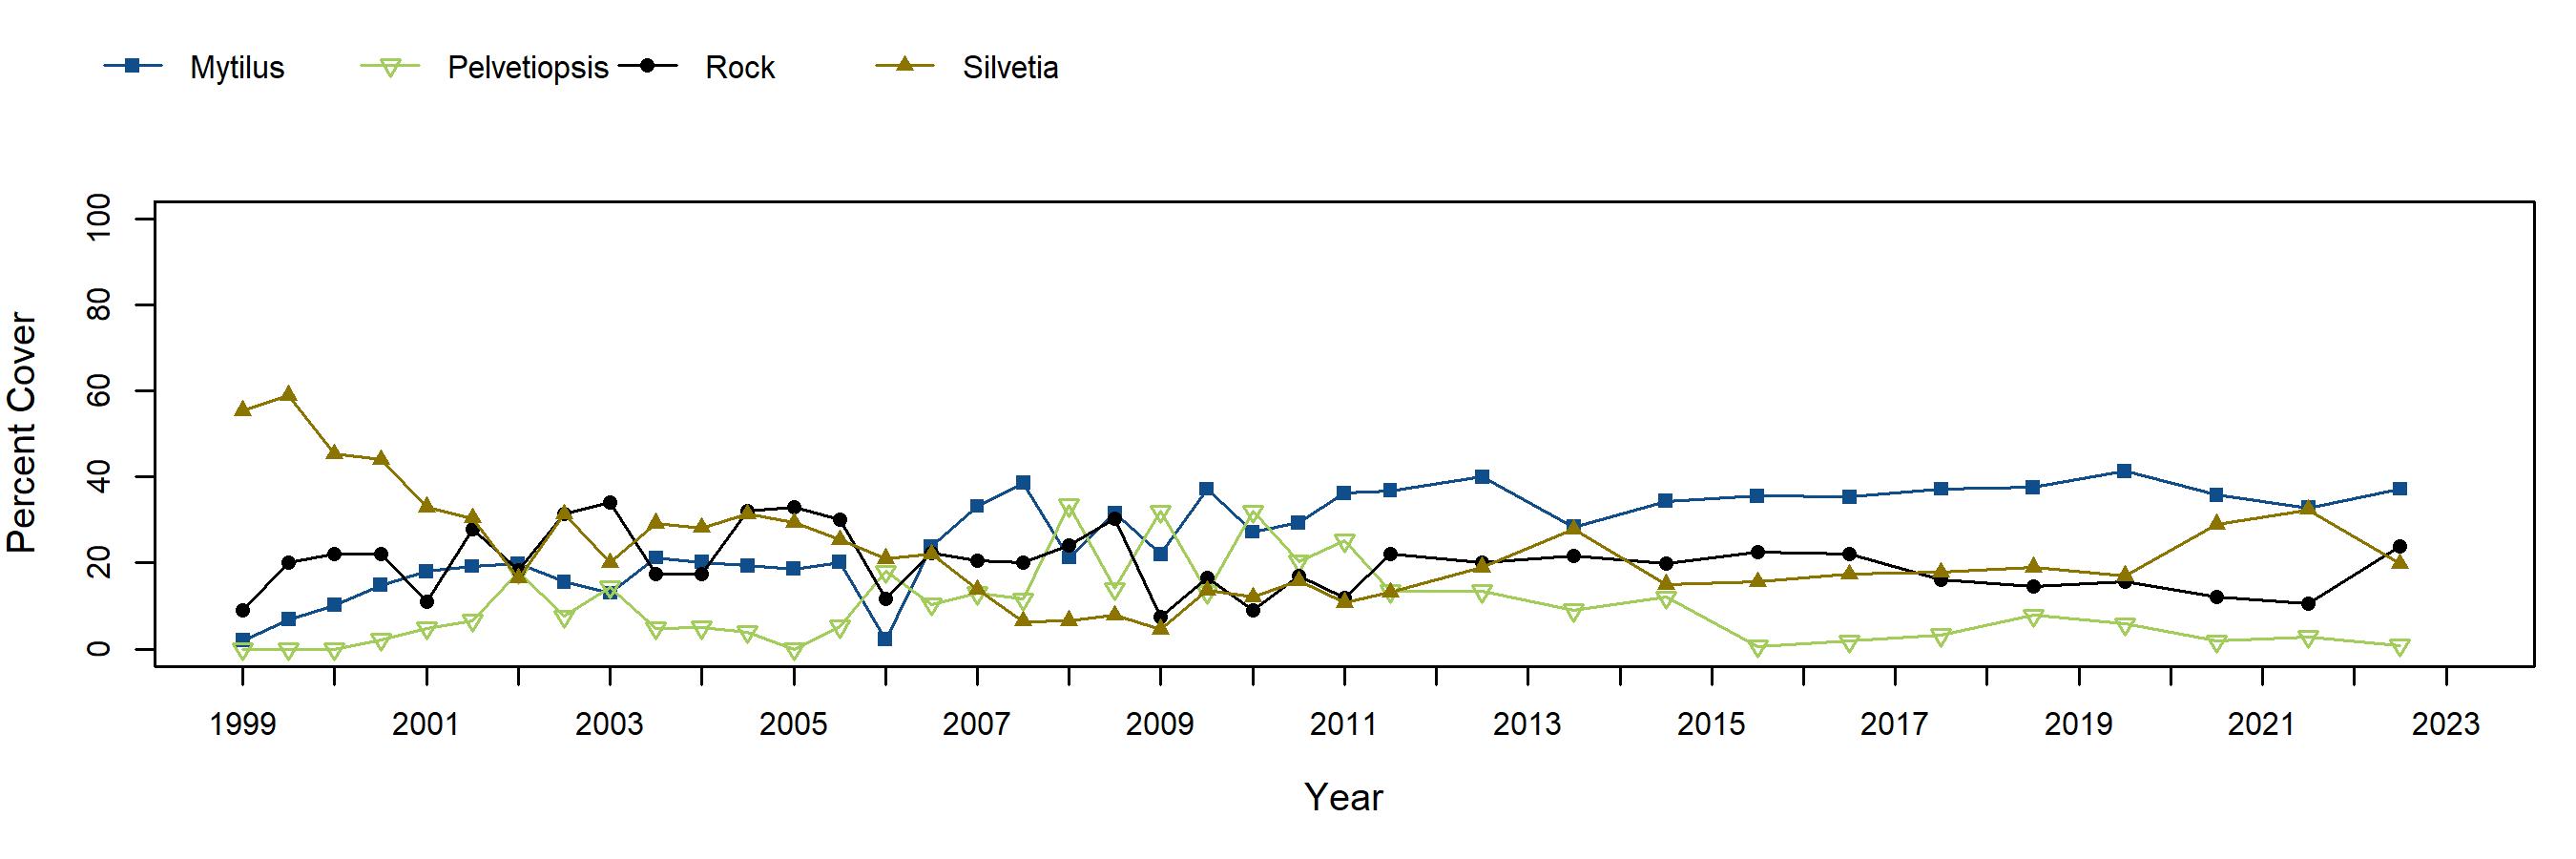 Terrace Point Silvetia trend plot